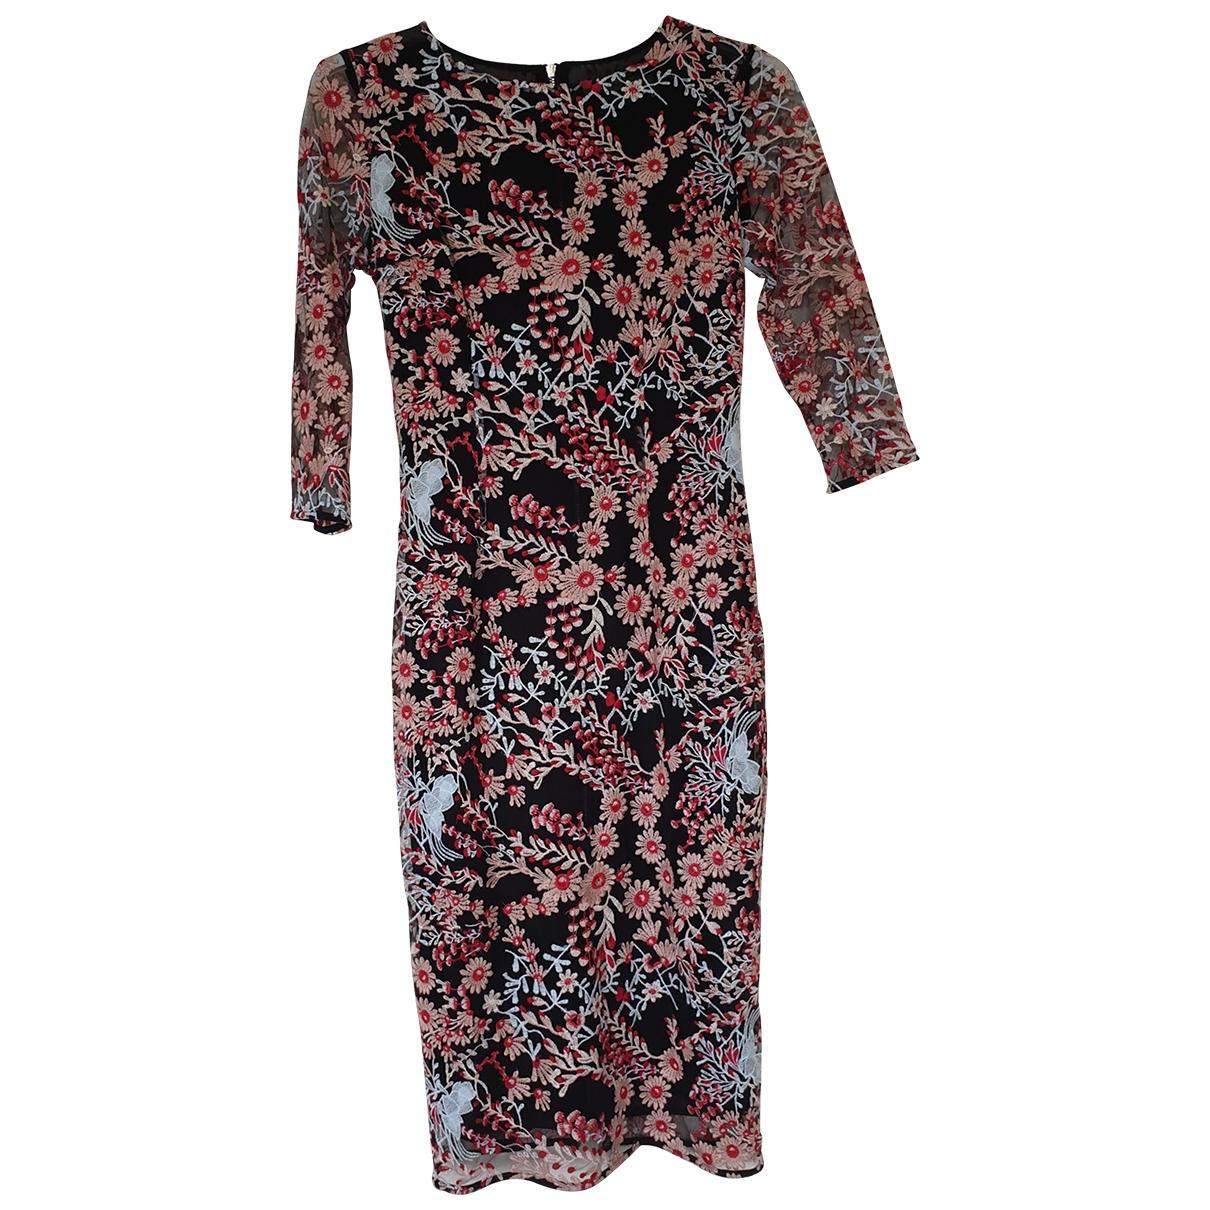 Uterque \N Multicolour Lace dress for Women 36 FR